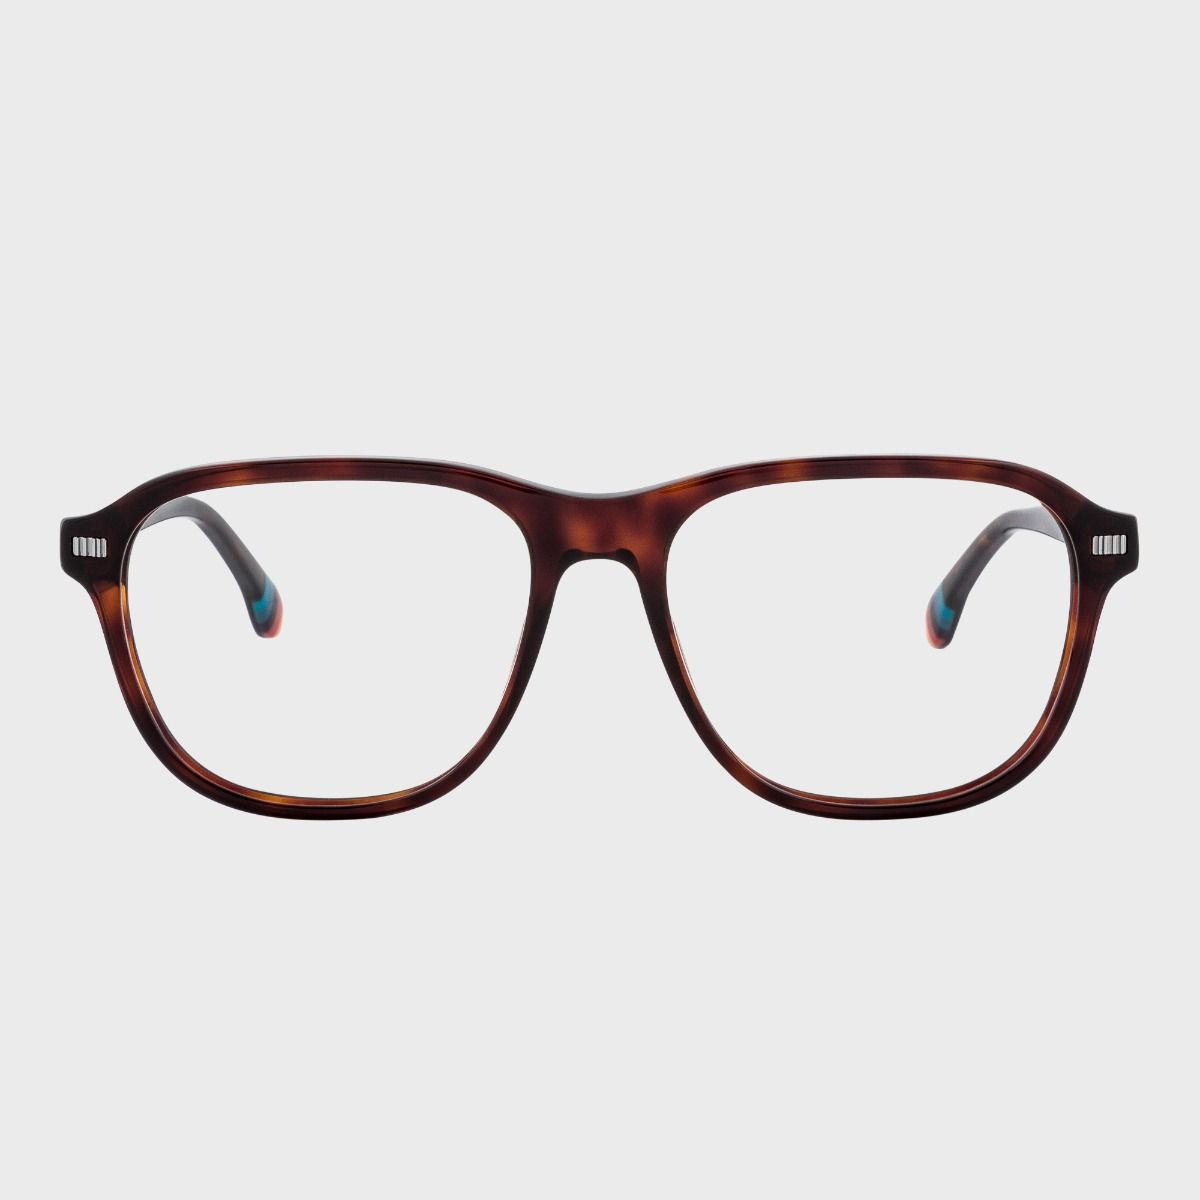 Paul Smith Duke Optical Square Glasses